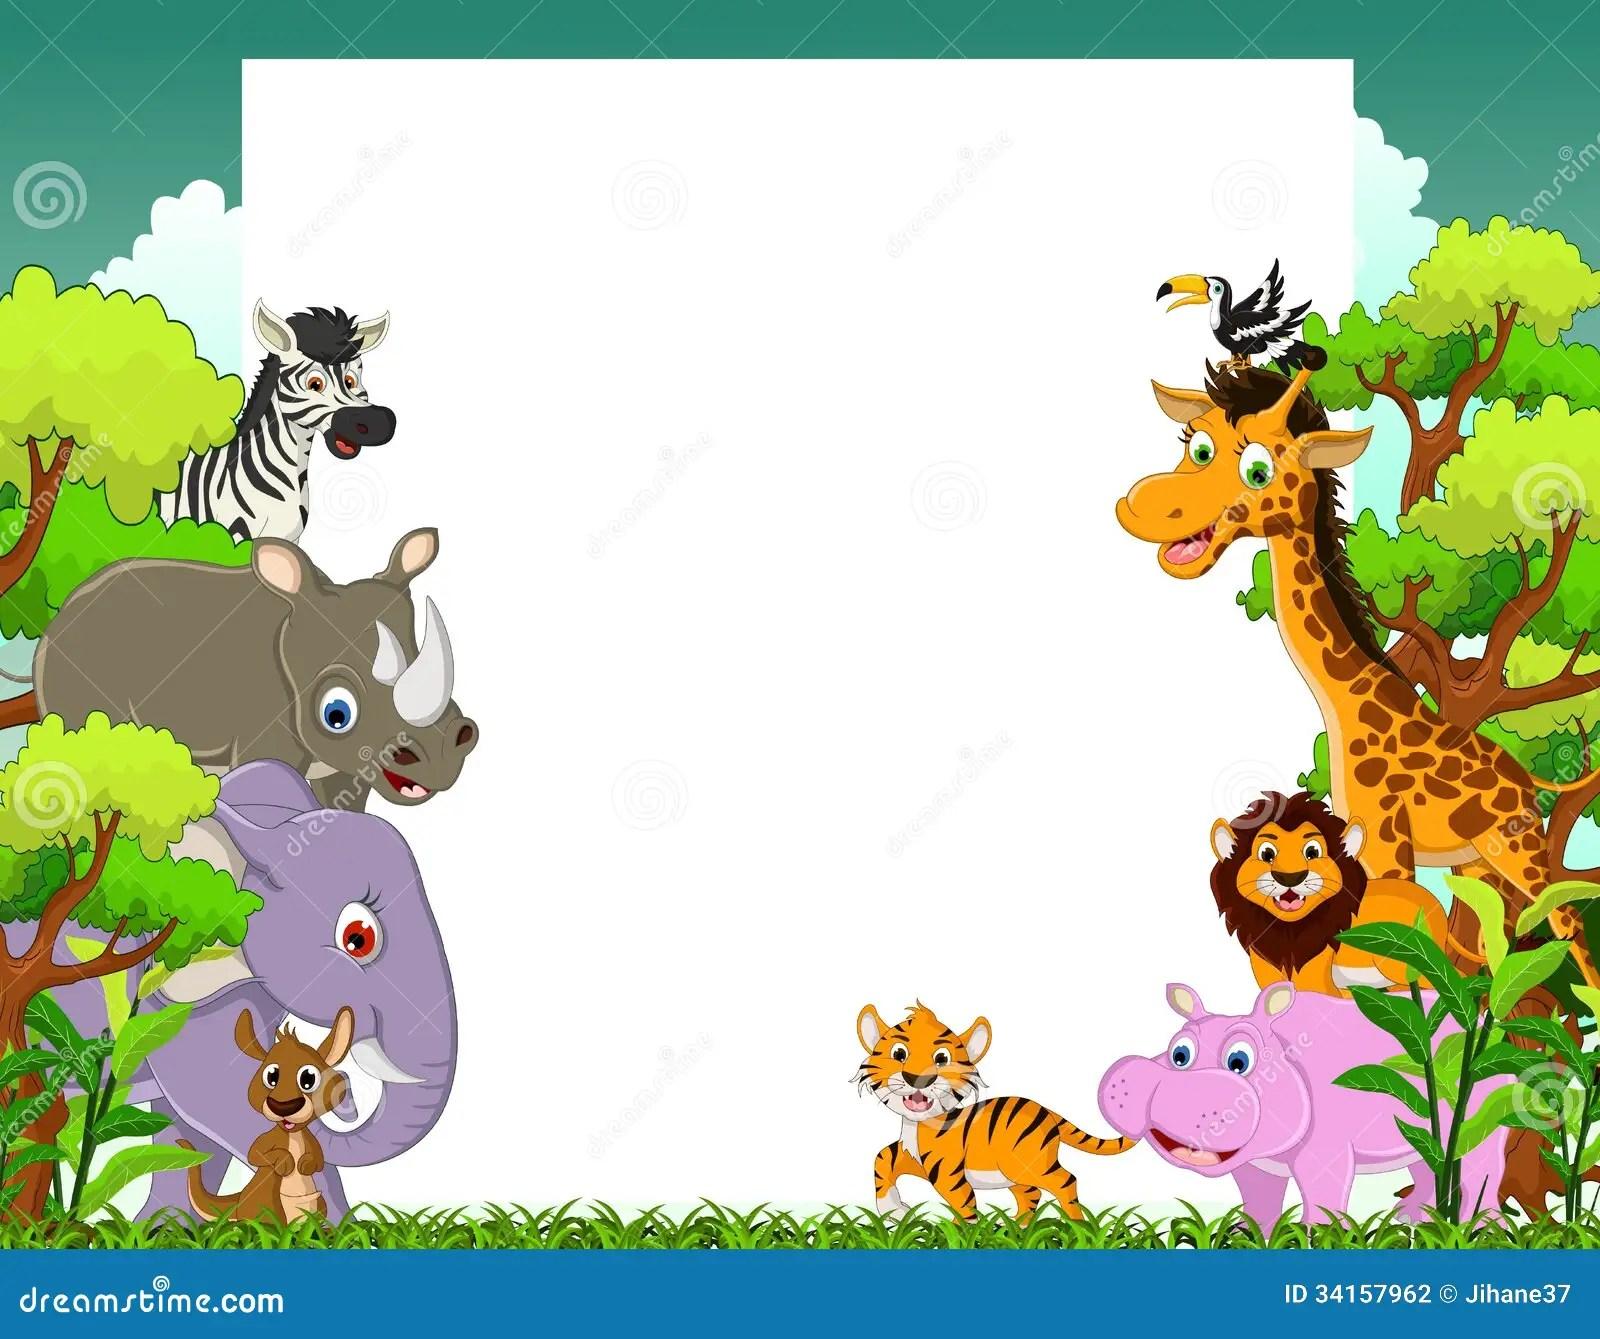 animal cartoon with blank